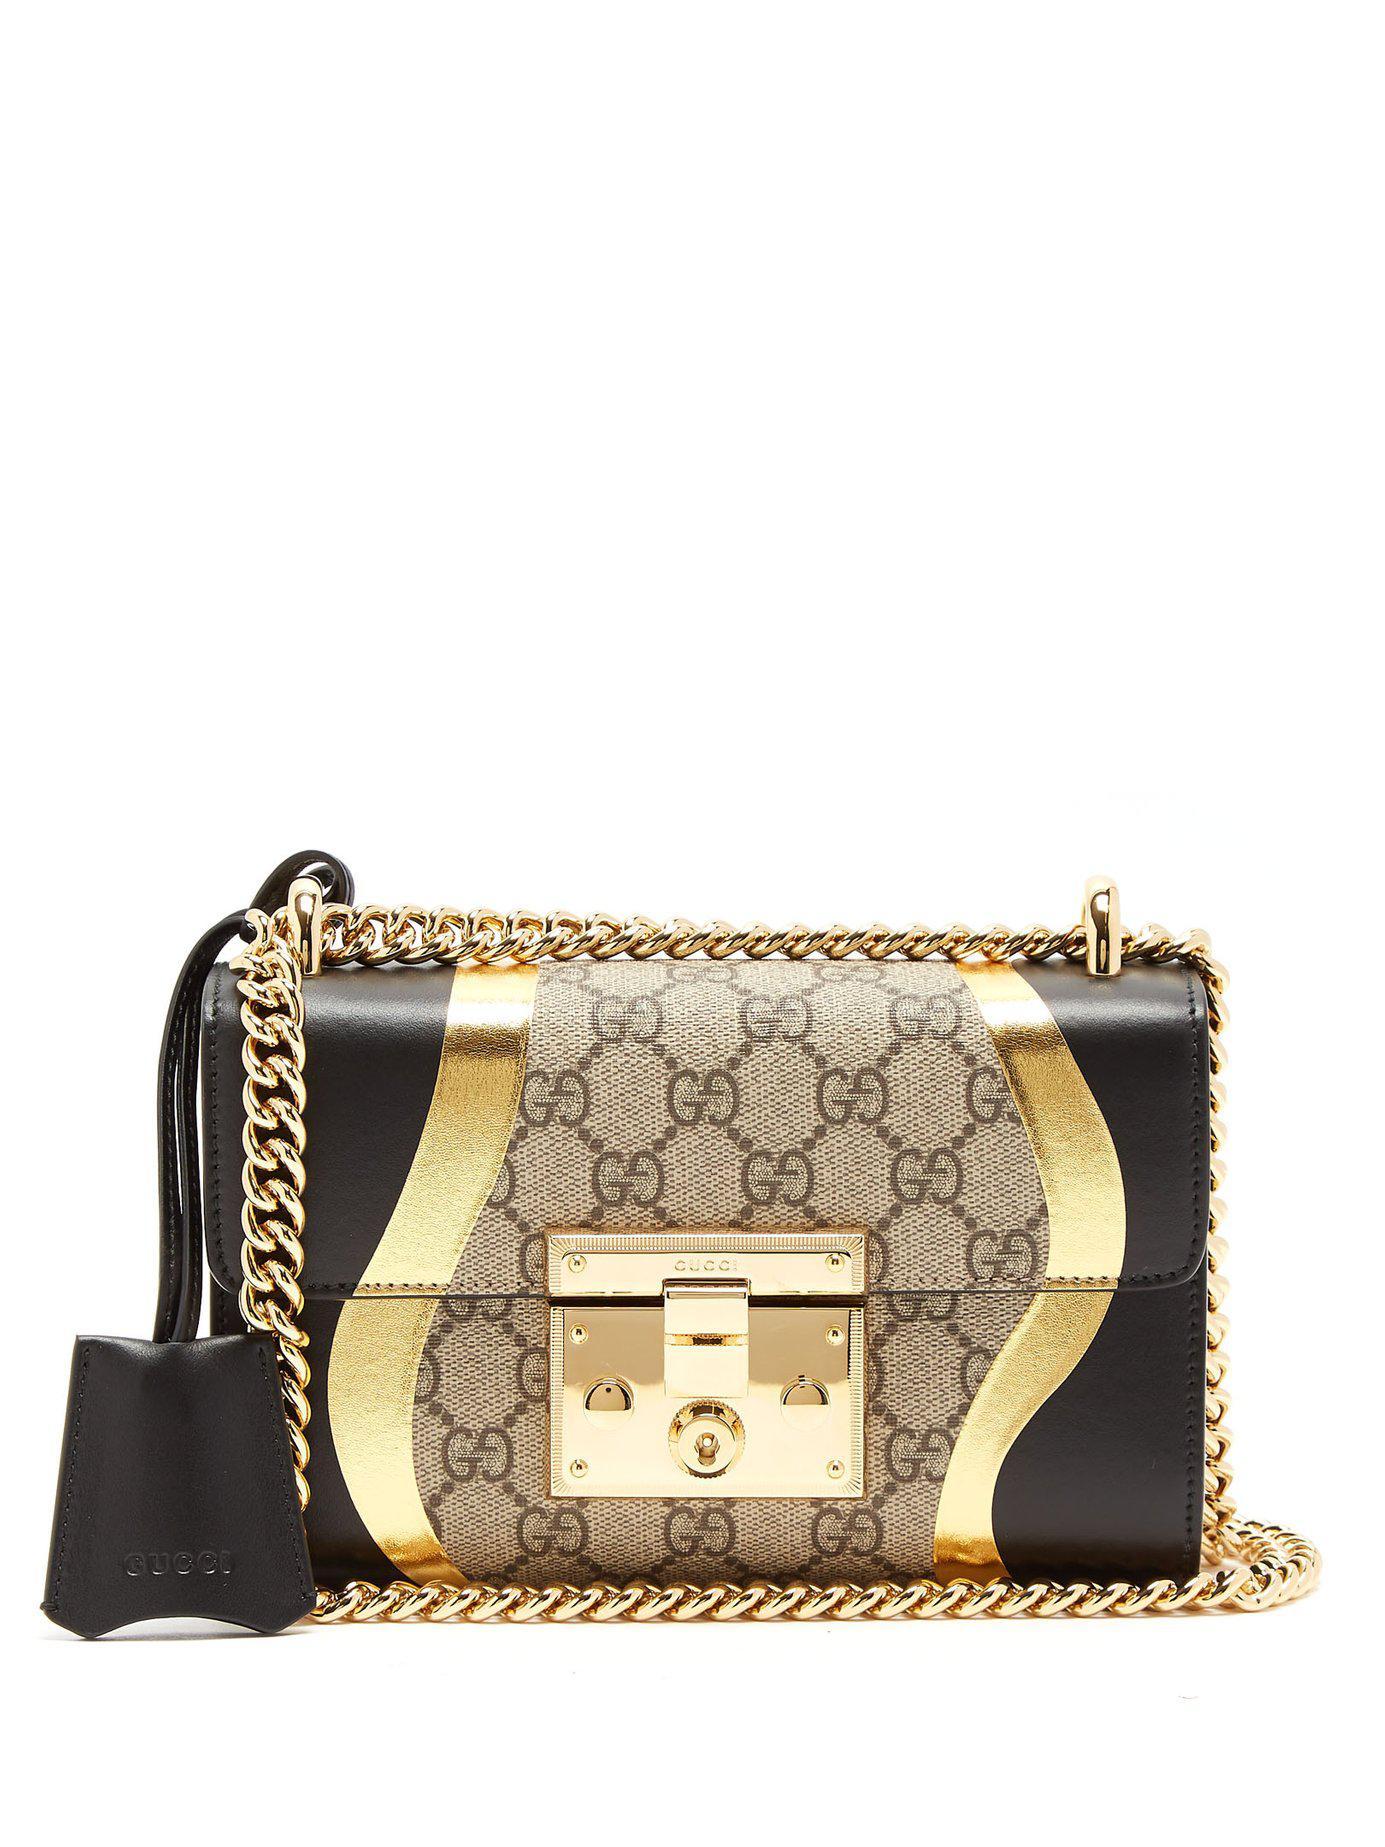 14e7ddd1eed9 Gucci. Women s Padlock Gg Supreme Leather Shoulder Bag